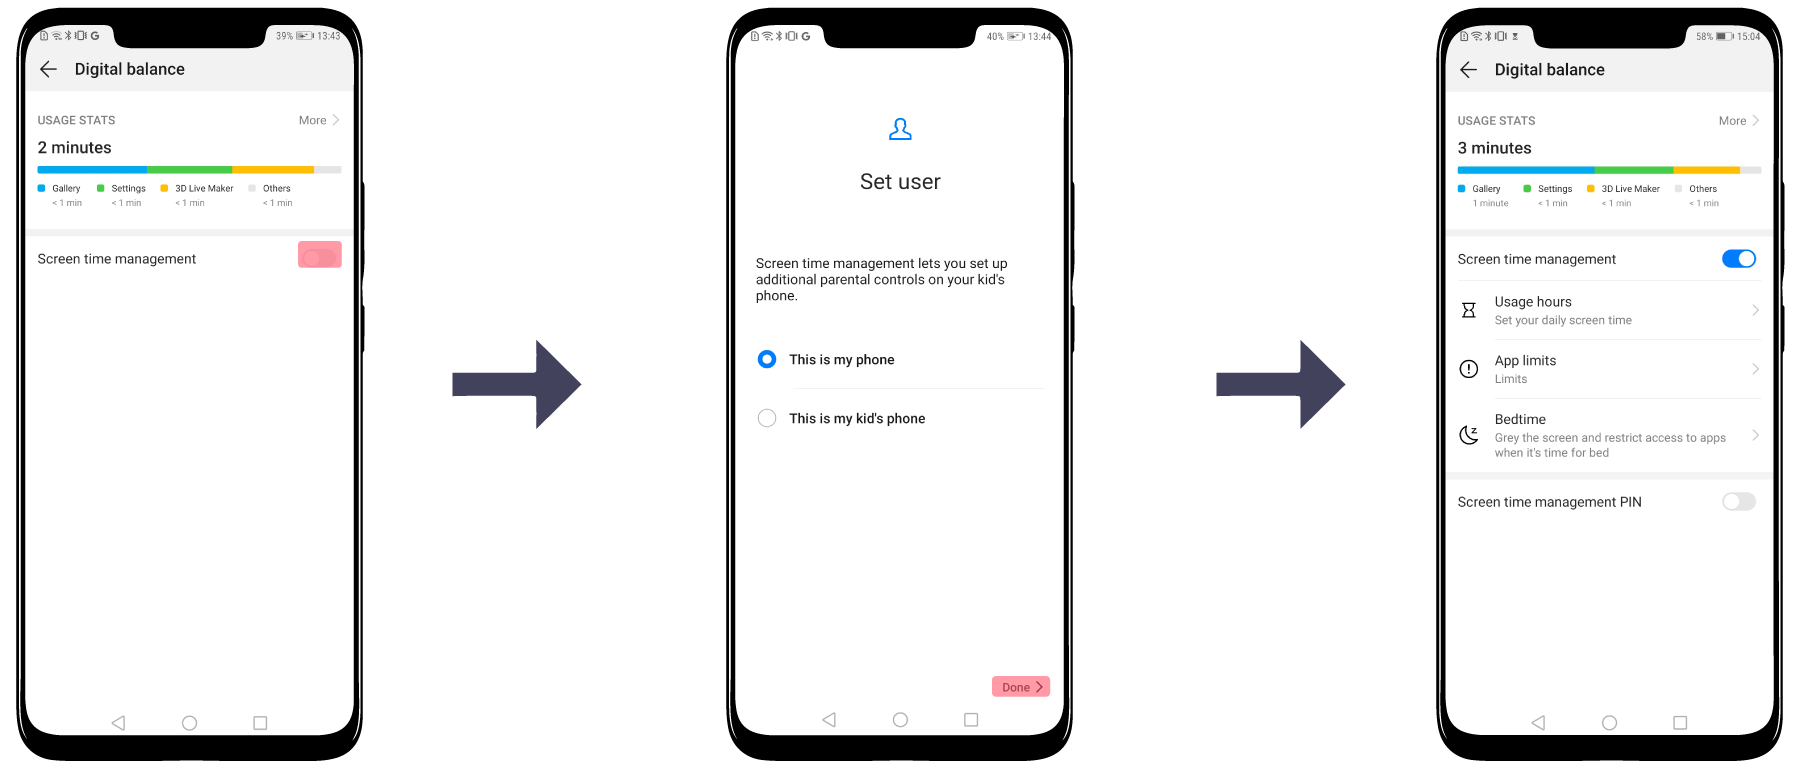 Manage your phone usage habits with Digital Balance